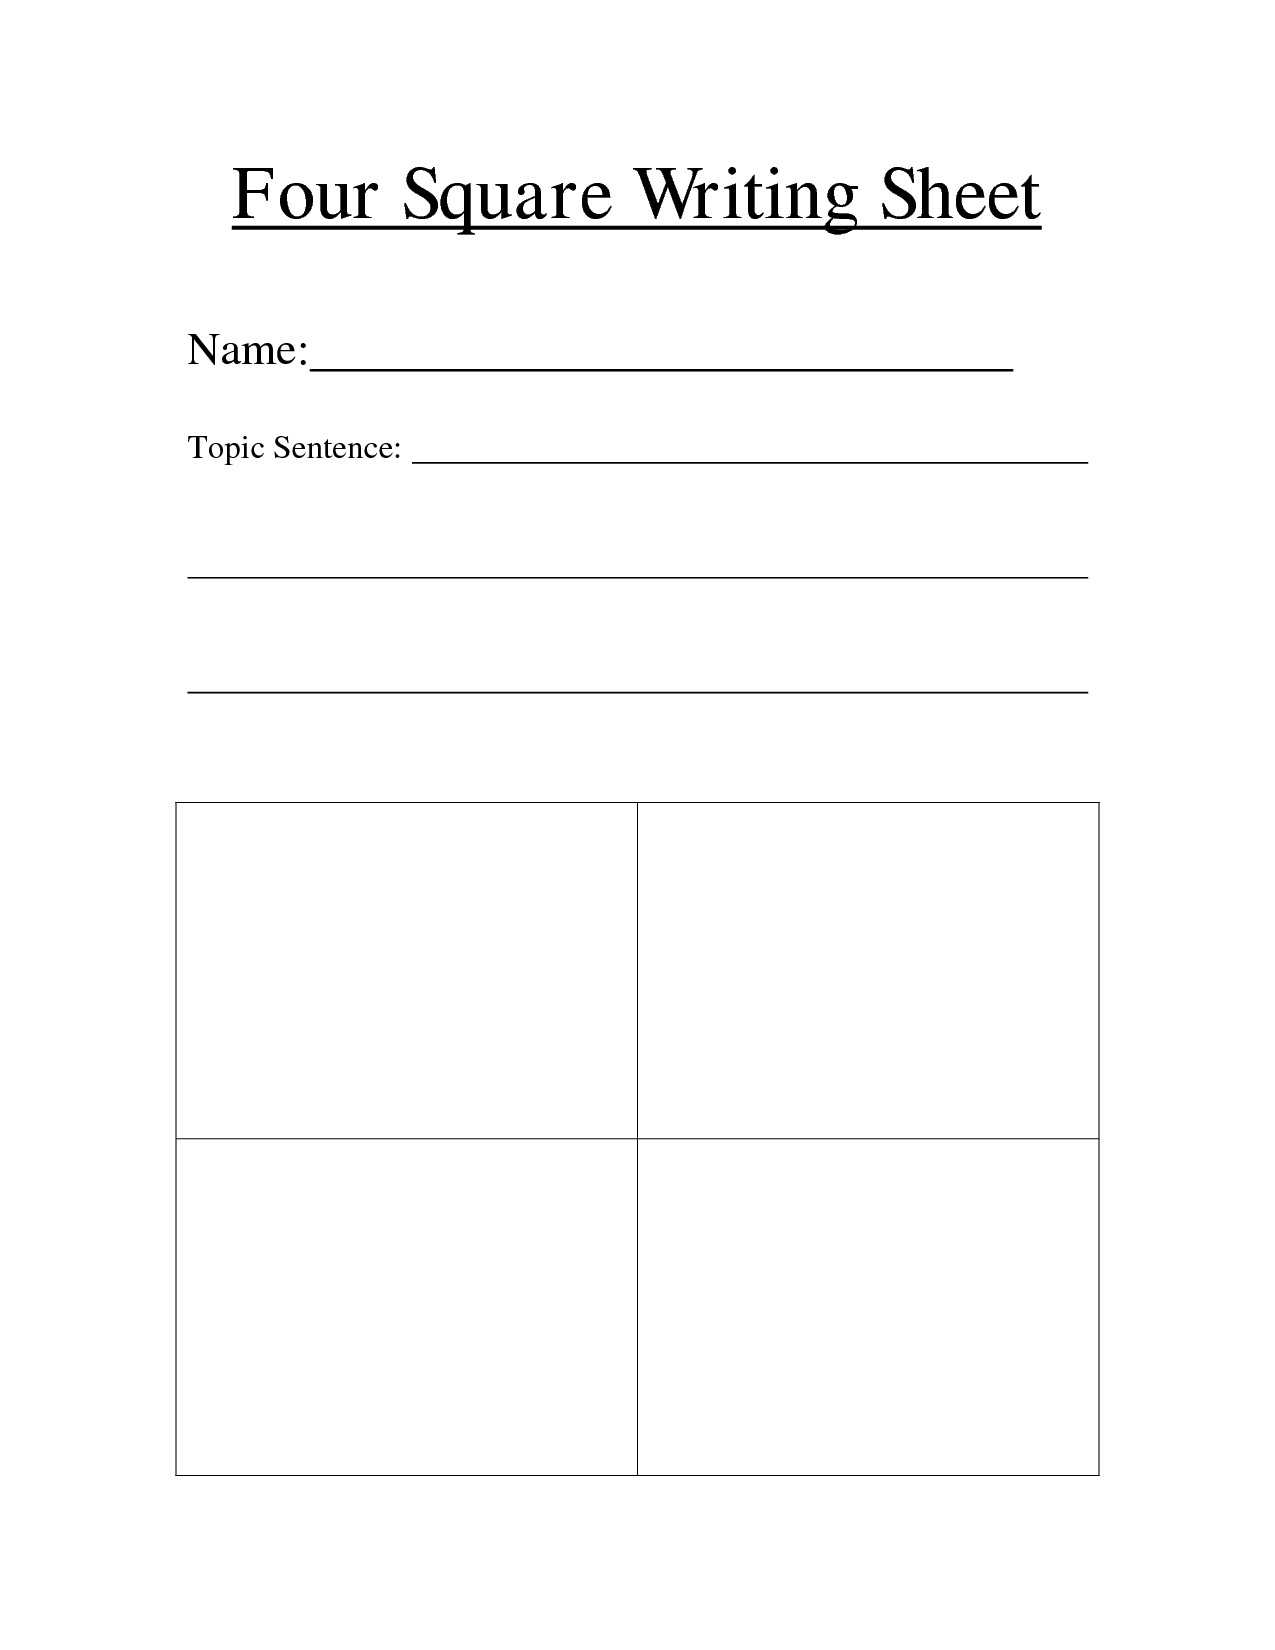 Wild Current Events Worksheet Printable